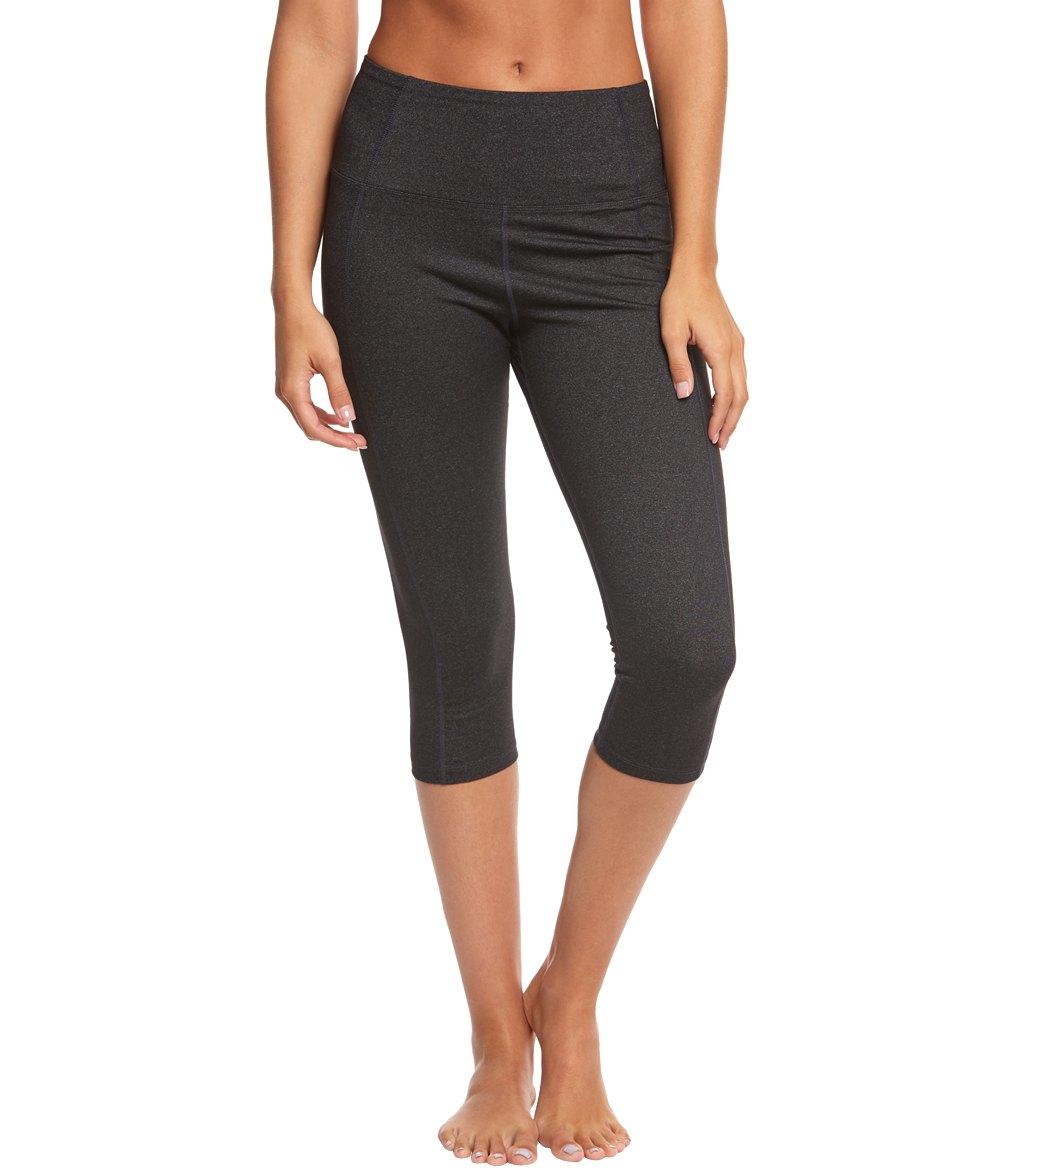 4ce2f35820 Marika Brooke High Rise Tummy Control Yoga Capris at YogaOutlet.com ...